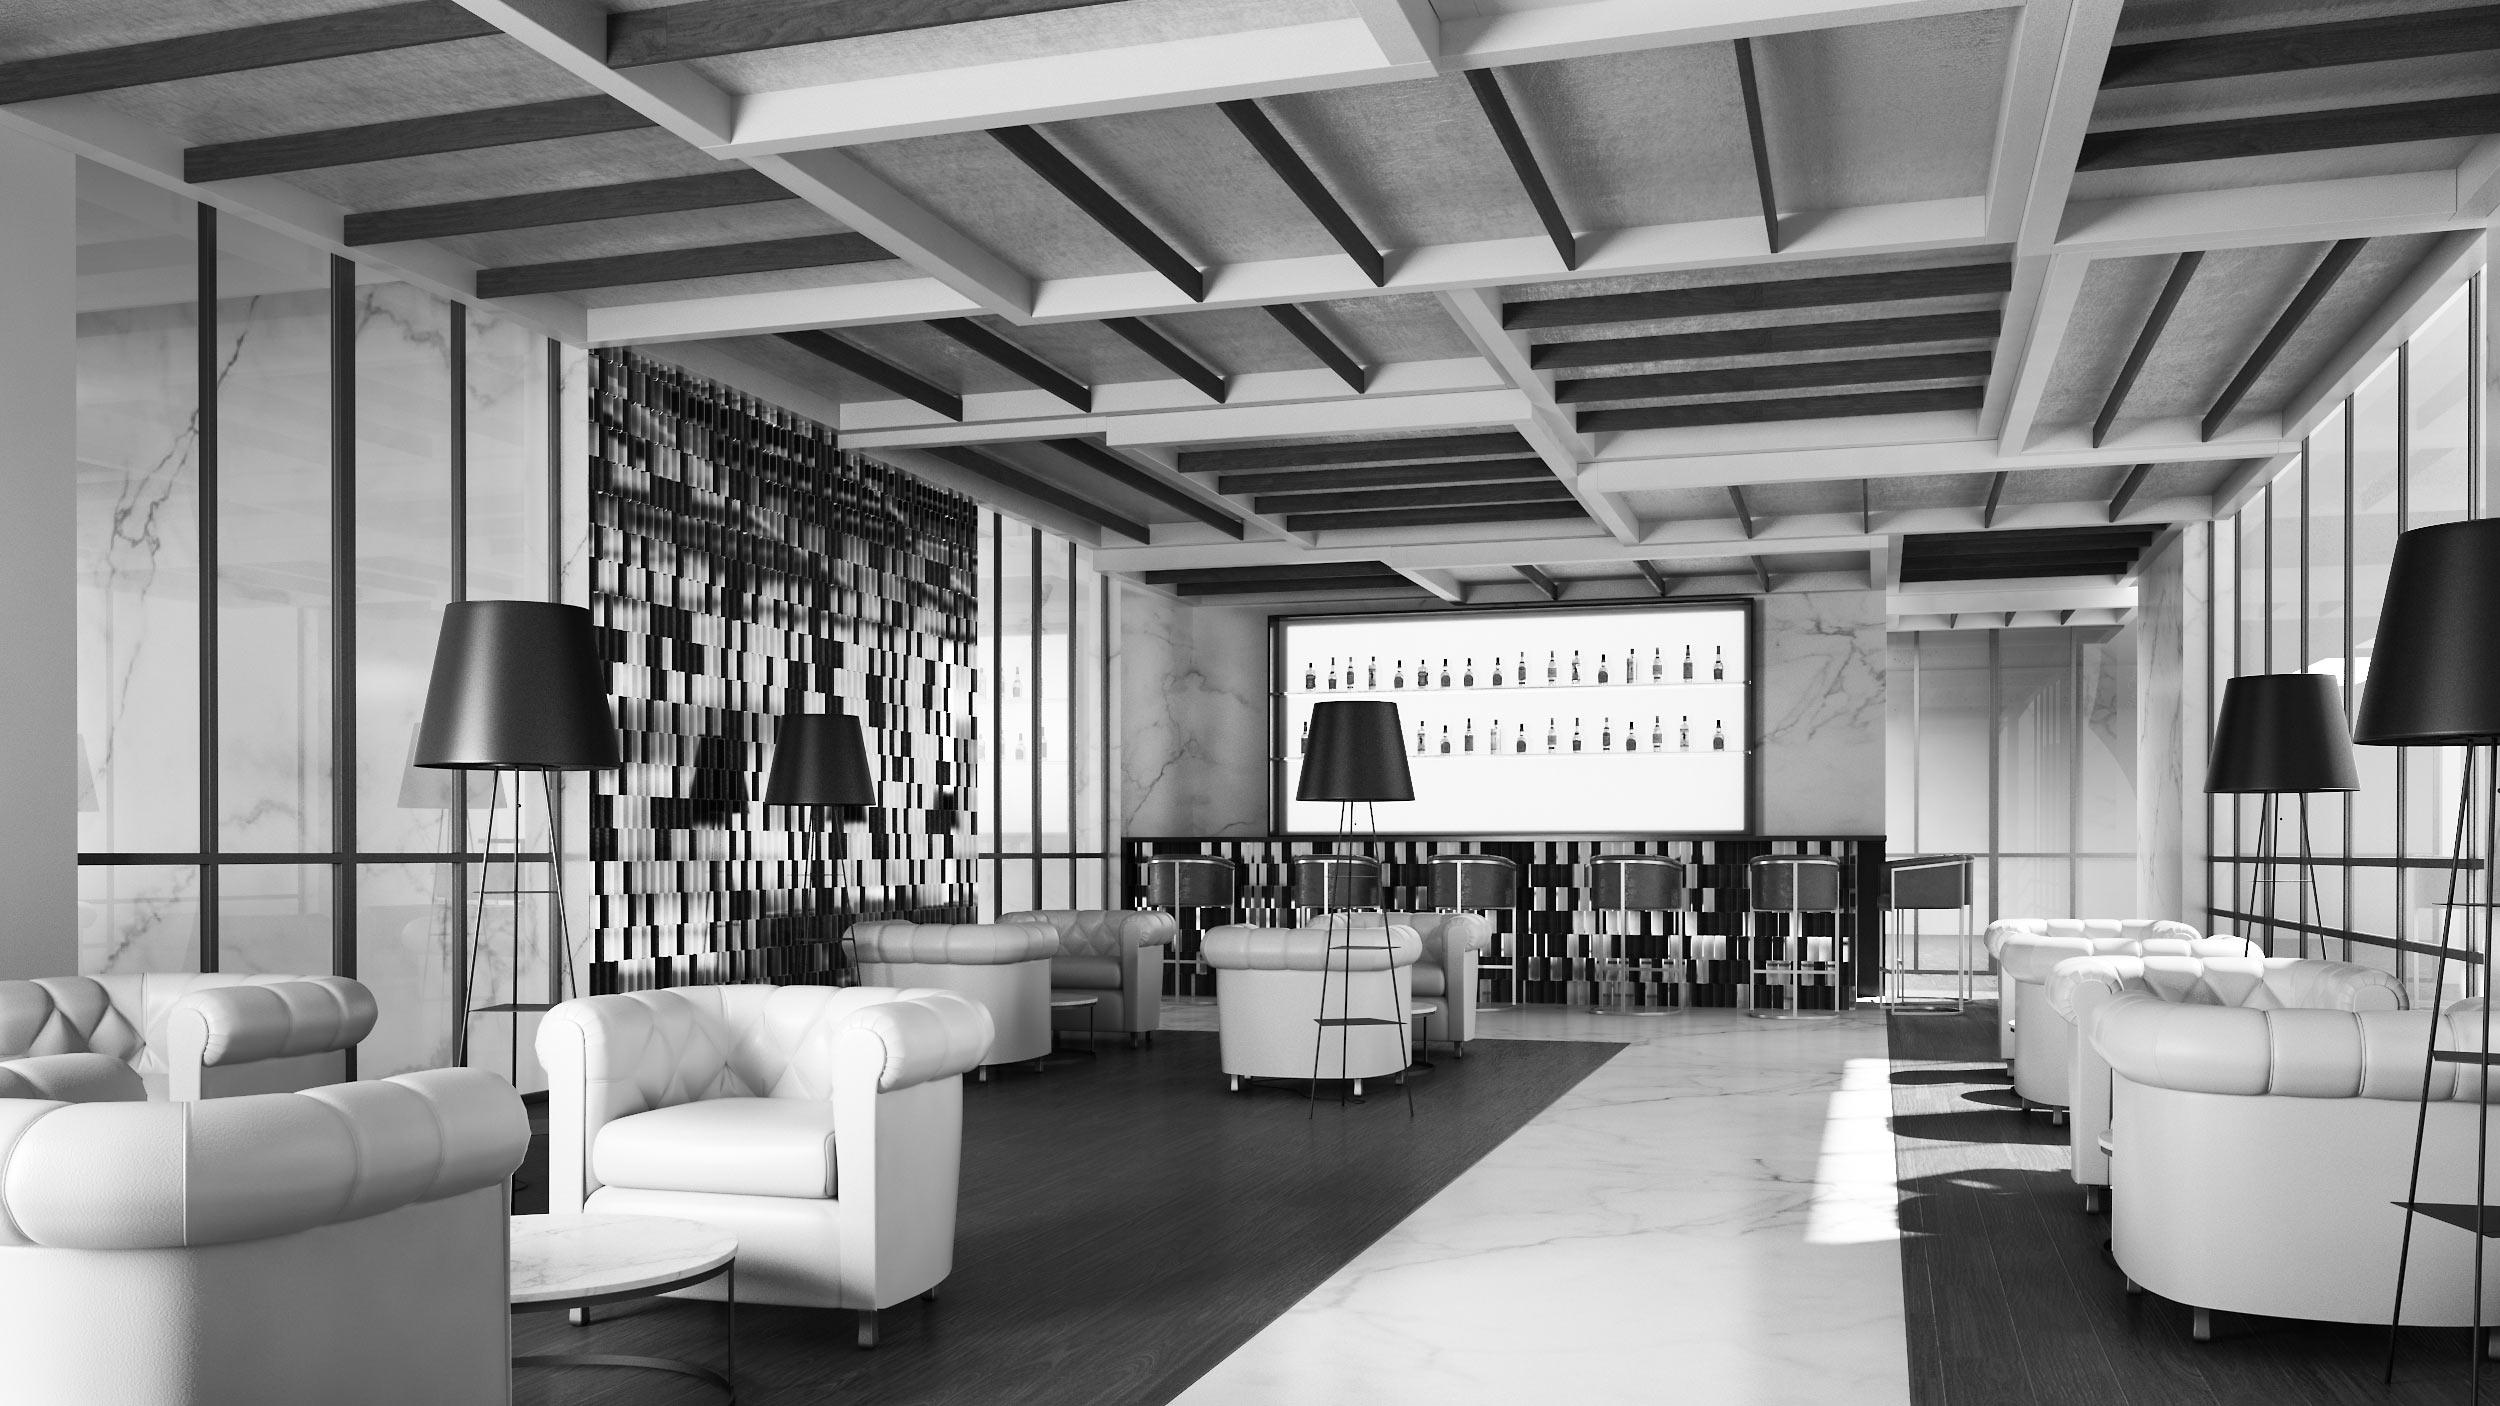 render-progetto-hotel-sirmione-marmo-bianco-bianco-nero